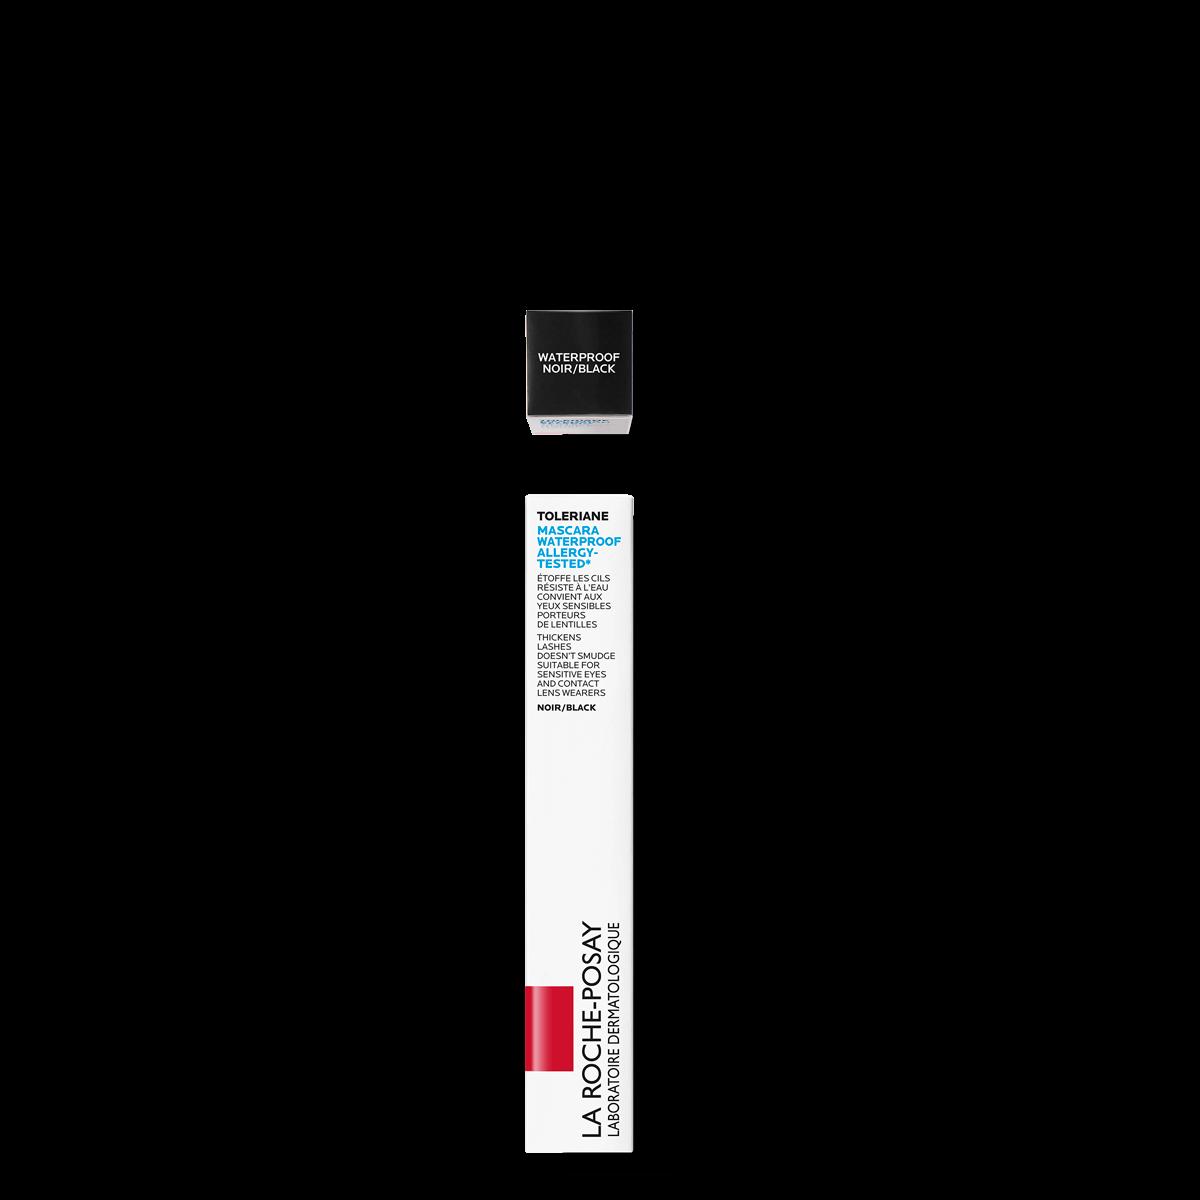 La Roche Posay Känslig Toleriane Make up WATERPROOF MASCARA Black 33